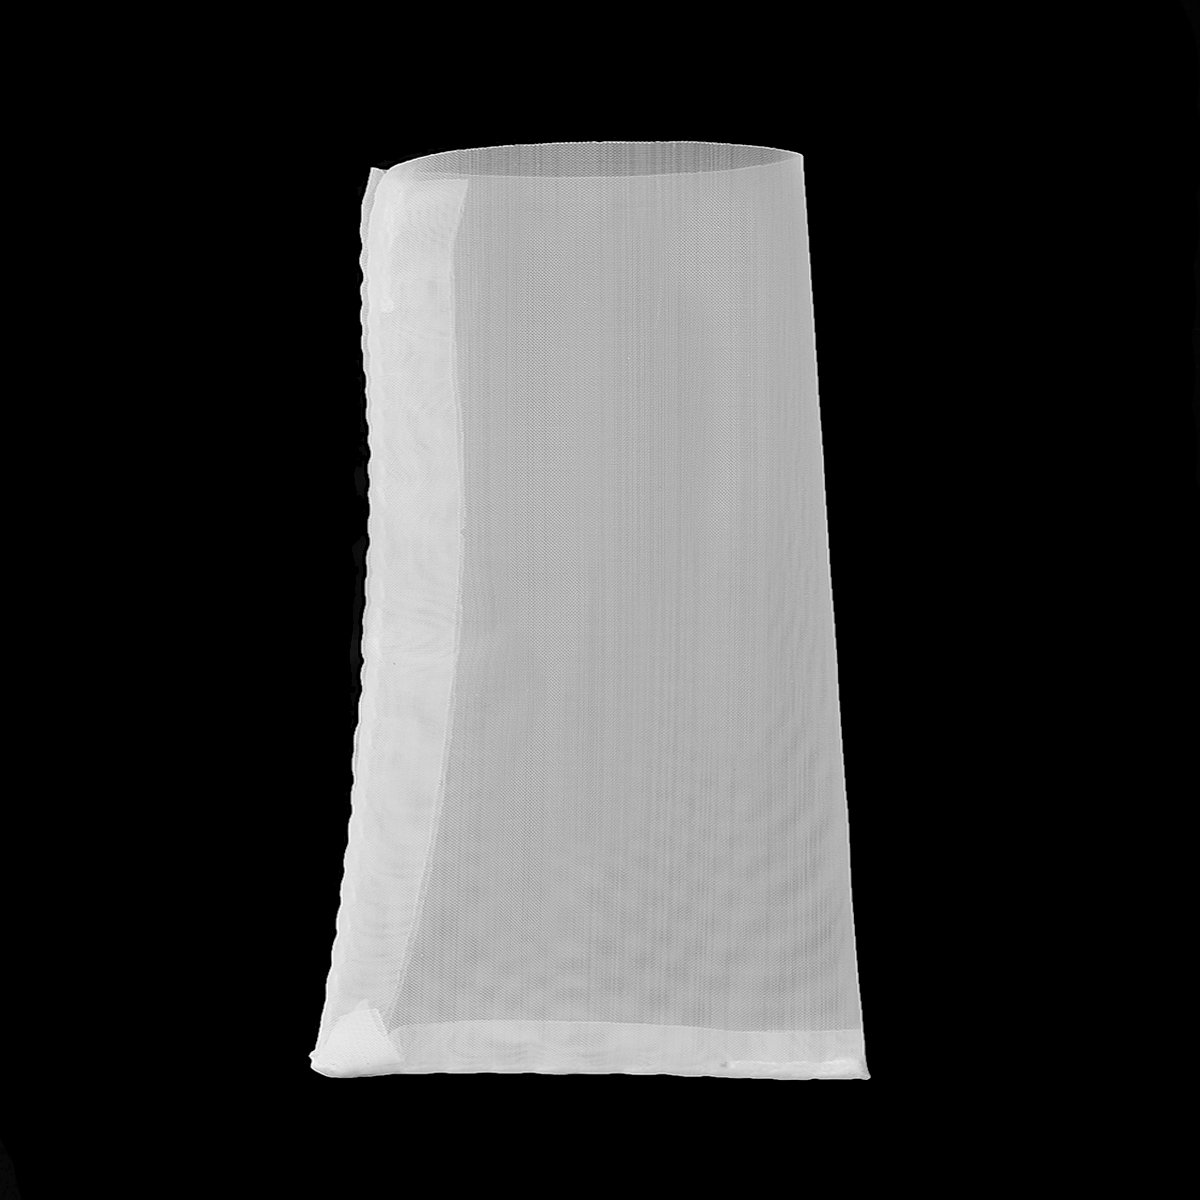 MJJEsports 50 Unids 2.5 X 4.5 Inch 40 Micron Rosin Nylon Pantalla Bolsas De Calor Prensa Rosin Filtro Bolsas